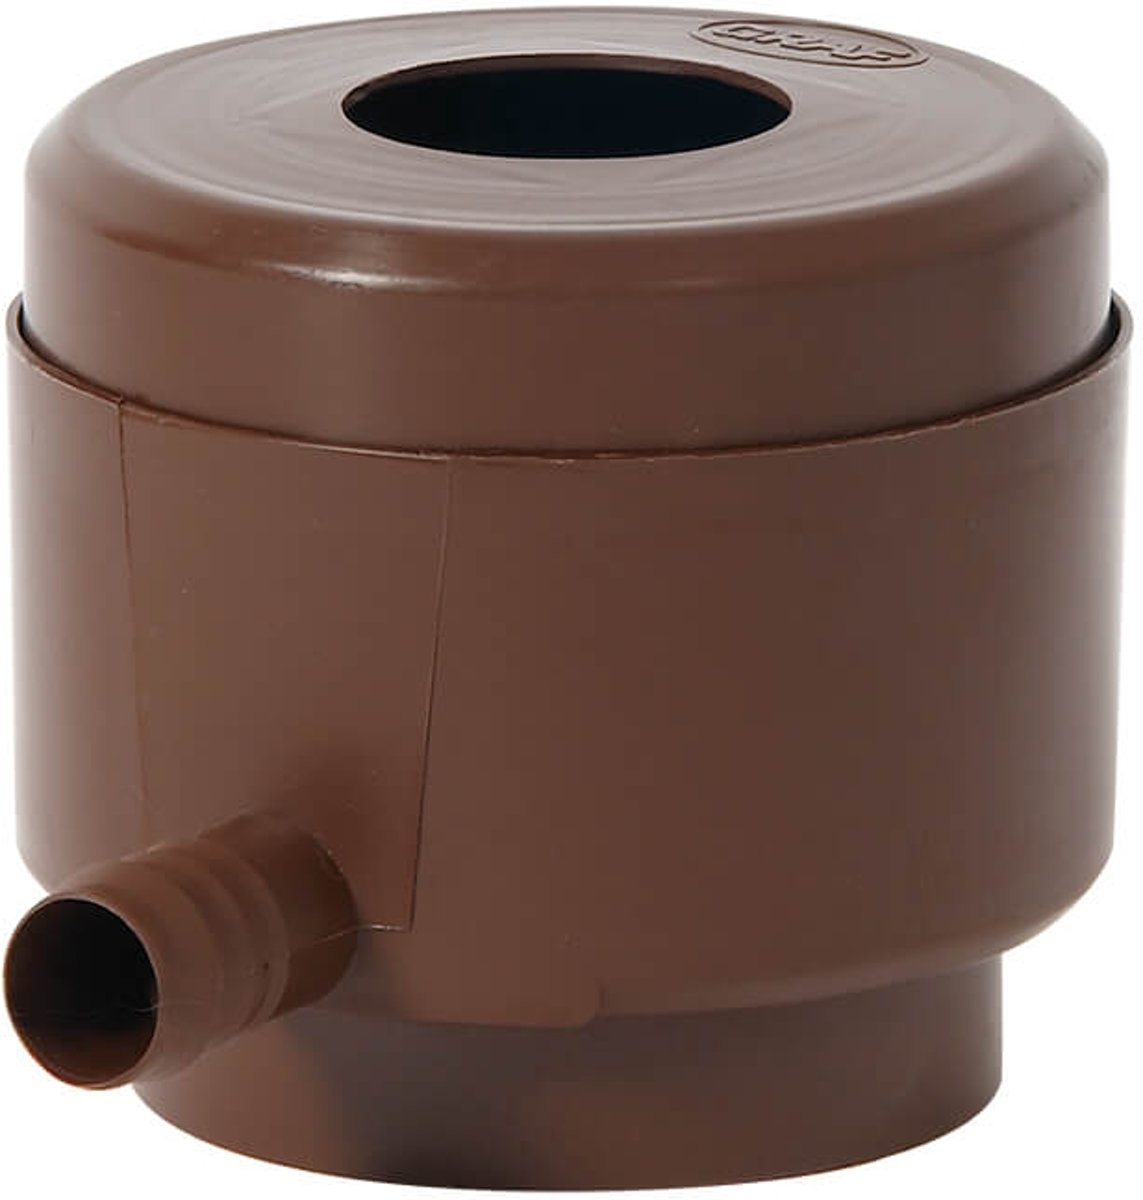 Garantia Regentonvulautomaat Bruin 70/100 mm